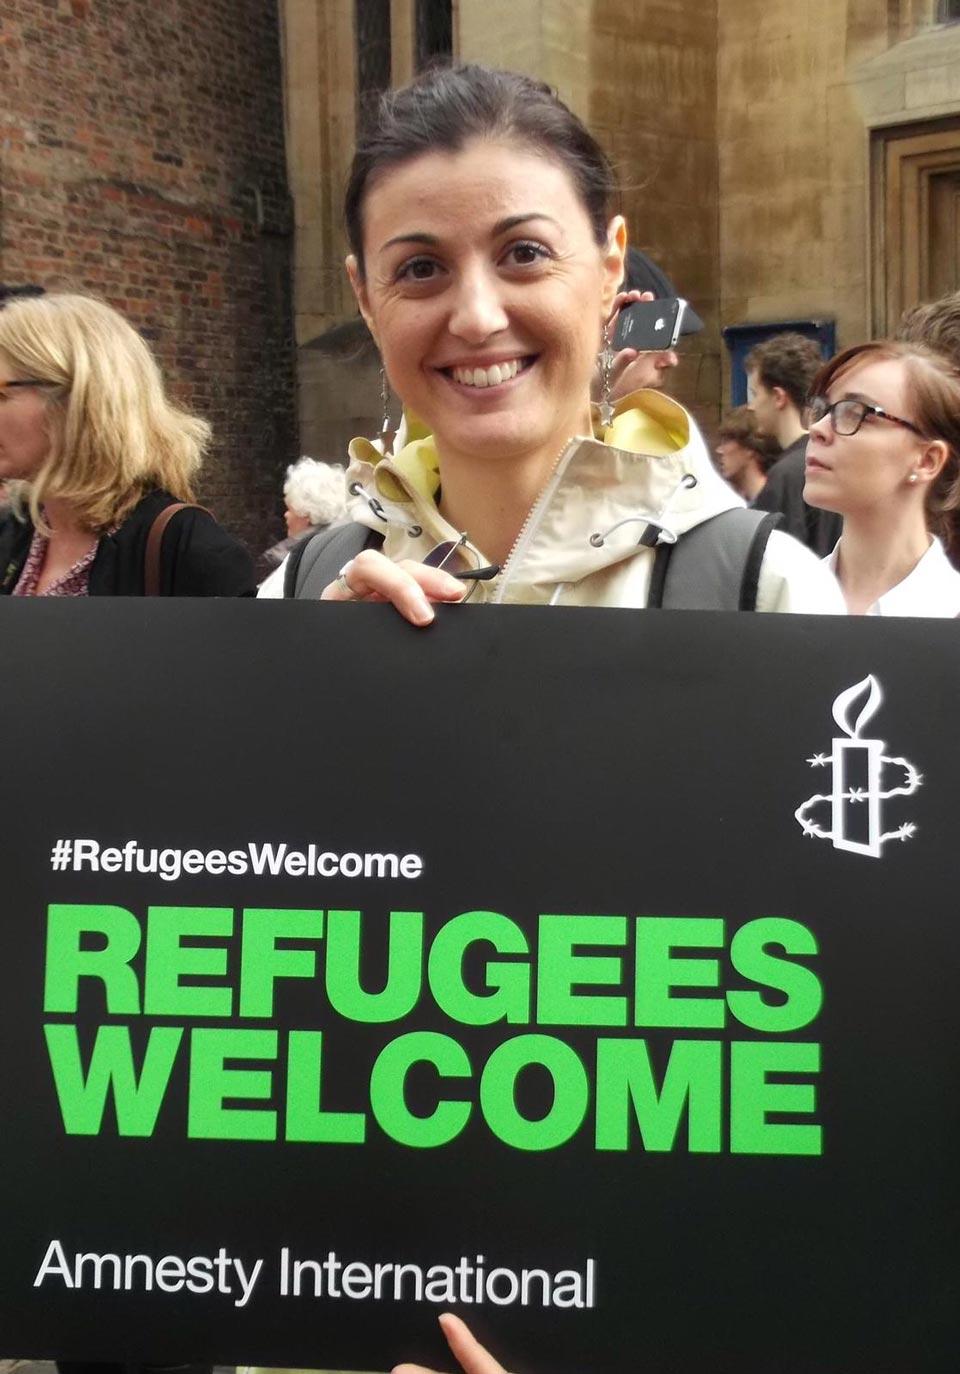 In Inghilterra durante una marcia in favore dei rifugiati con Amnesty International